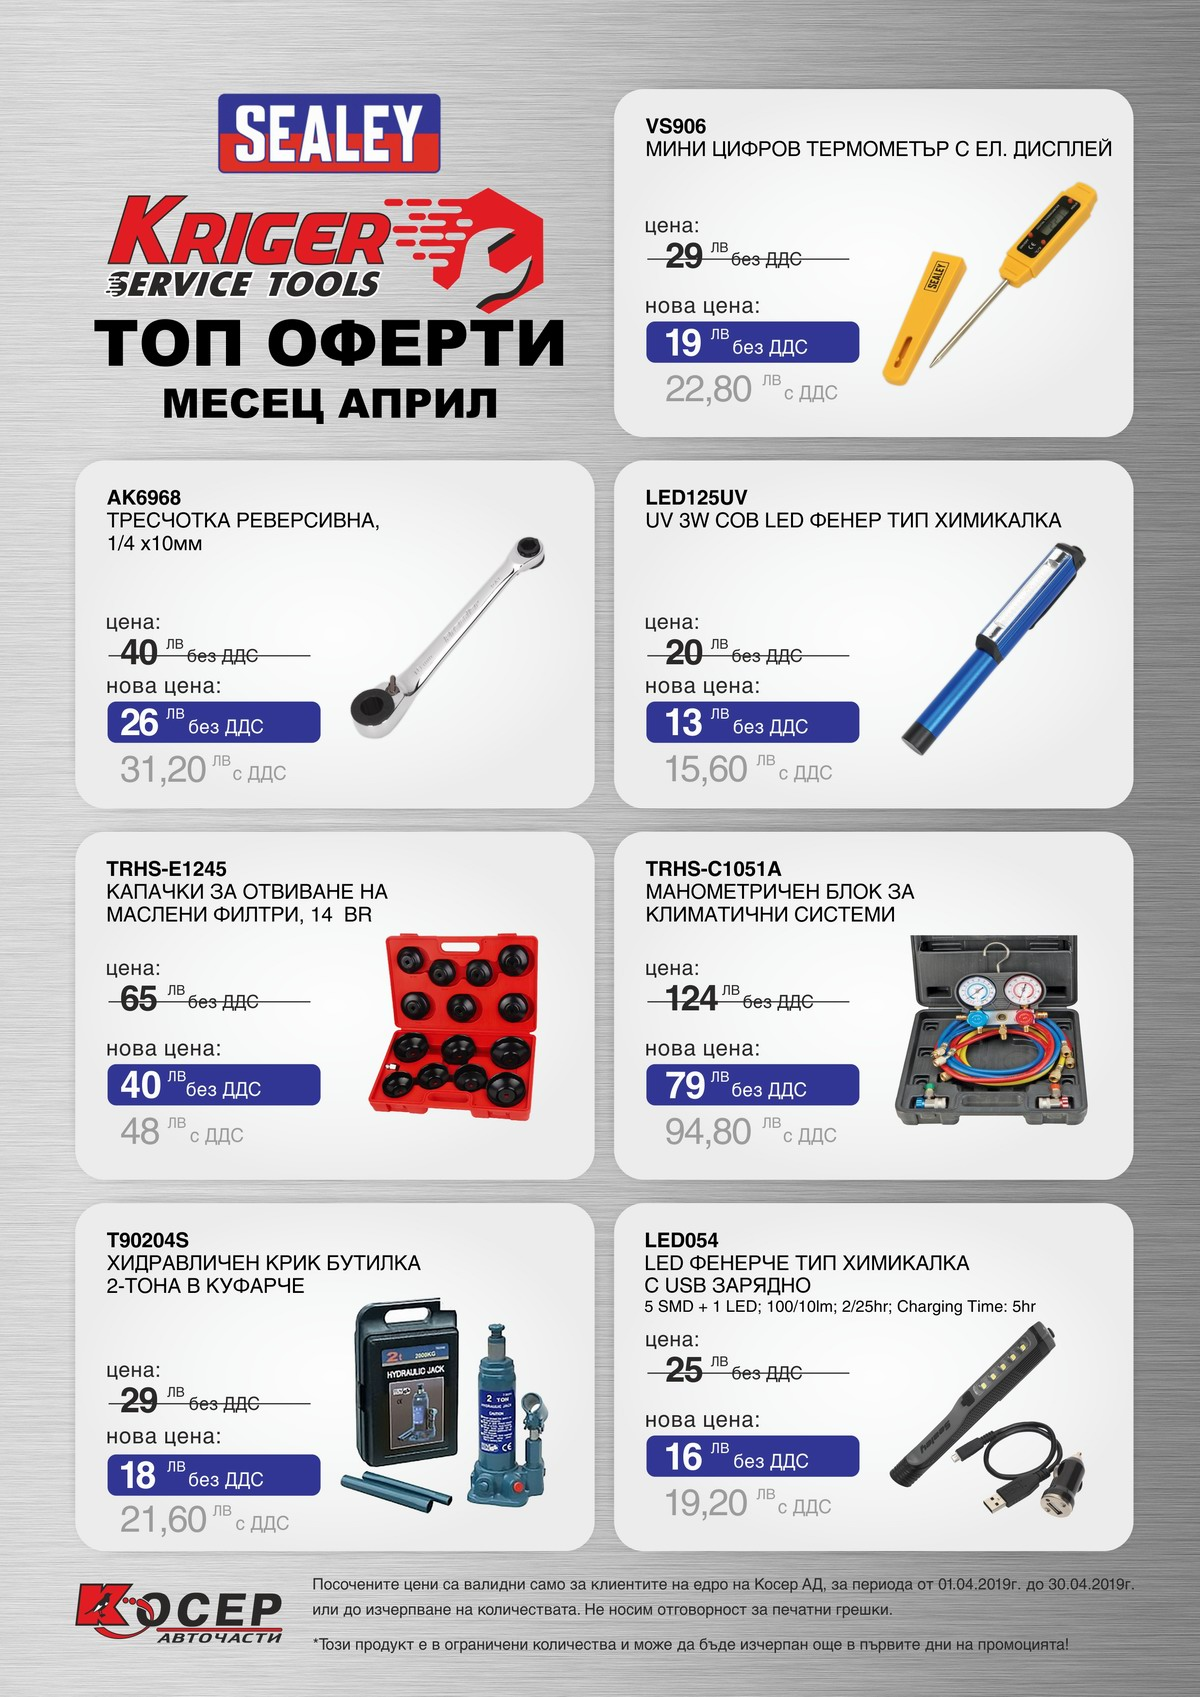 Промоция KRIGER Tools, 01.04.2019 - 30.04.2019